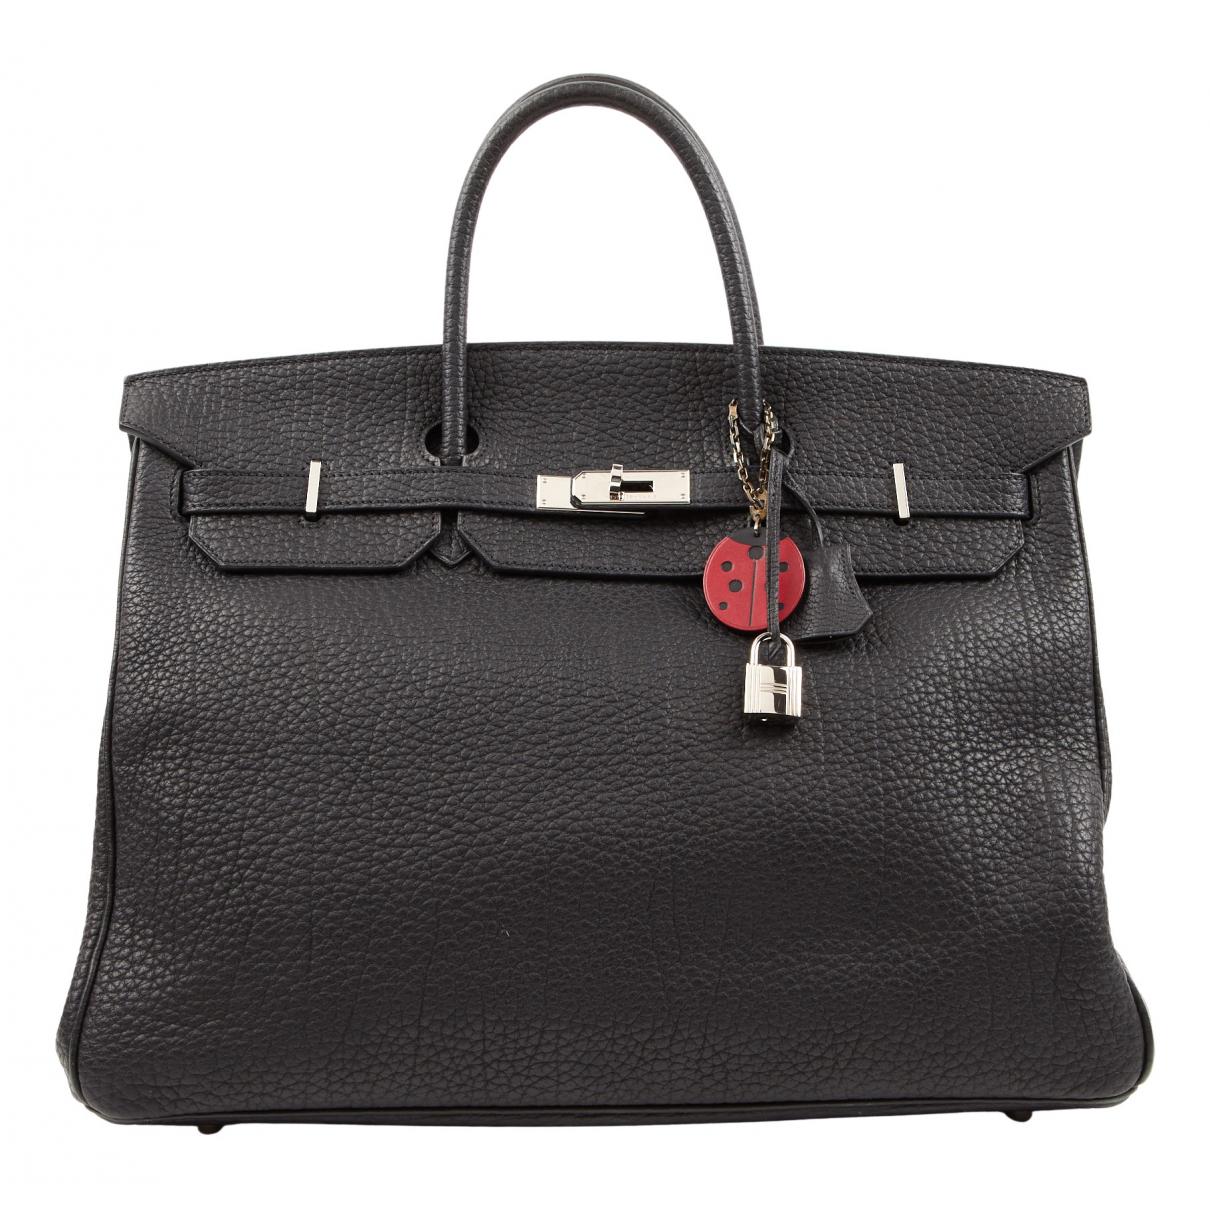 Hermes - Sac a main Birkin 40 pour femme en cuir - noir